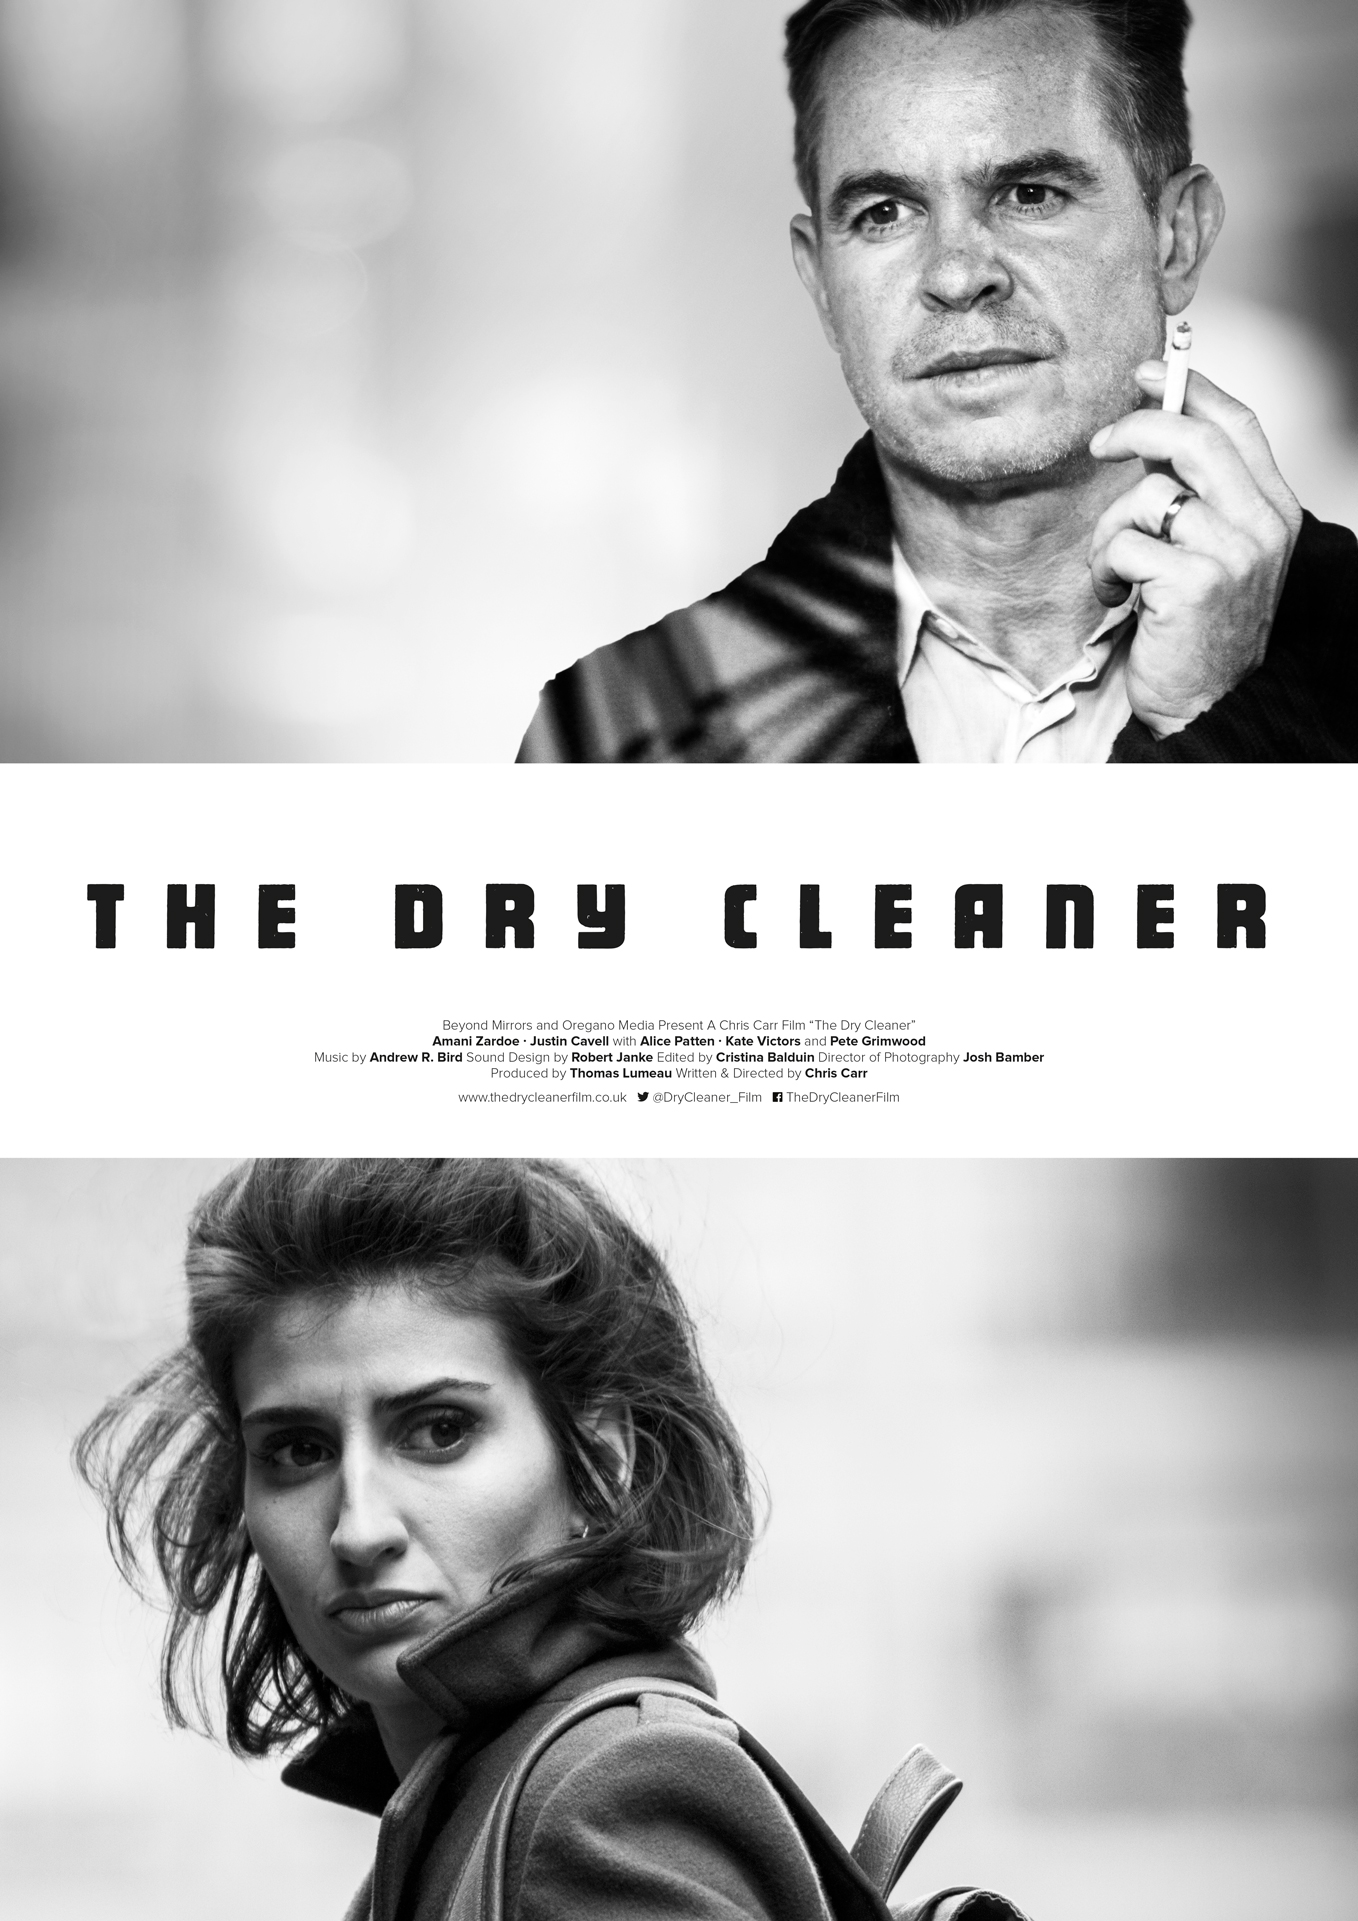 DryCleanerFilm_poster.jpg